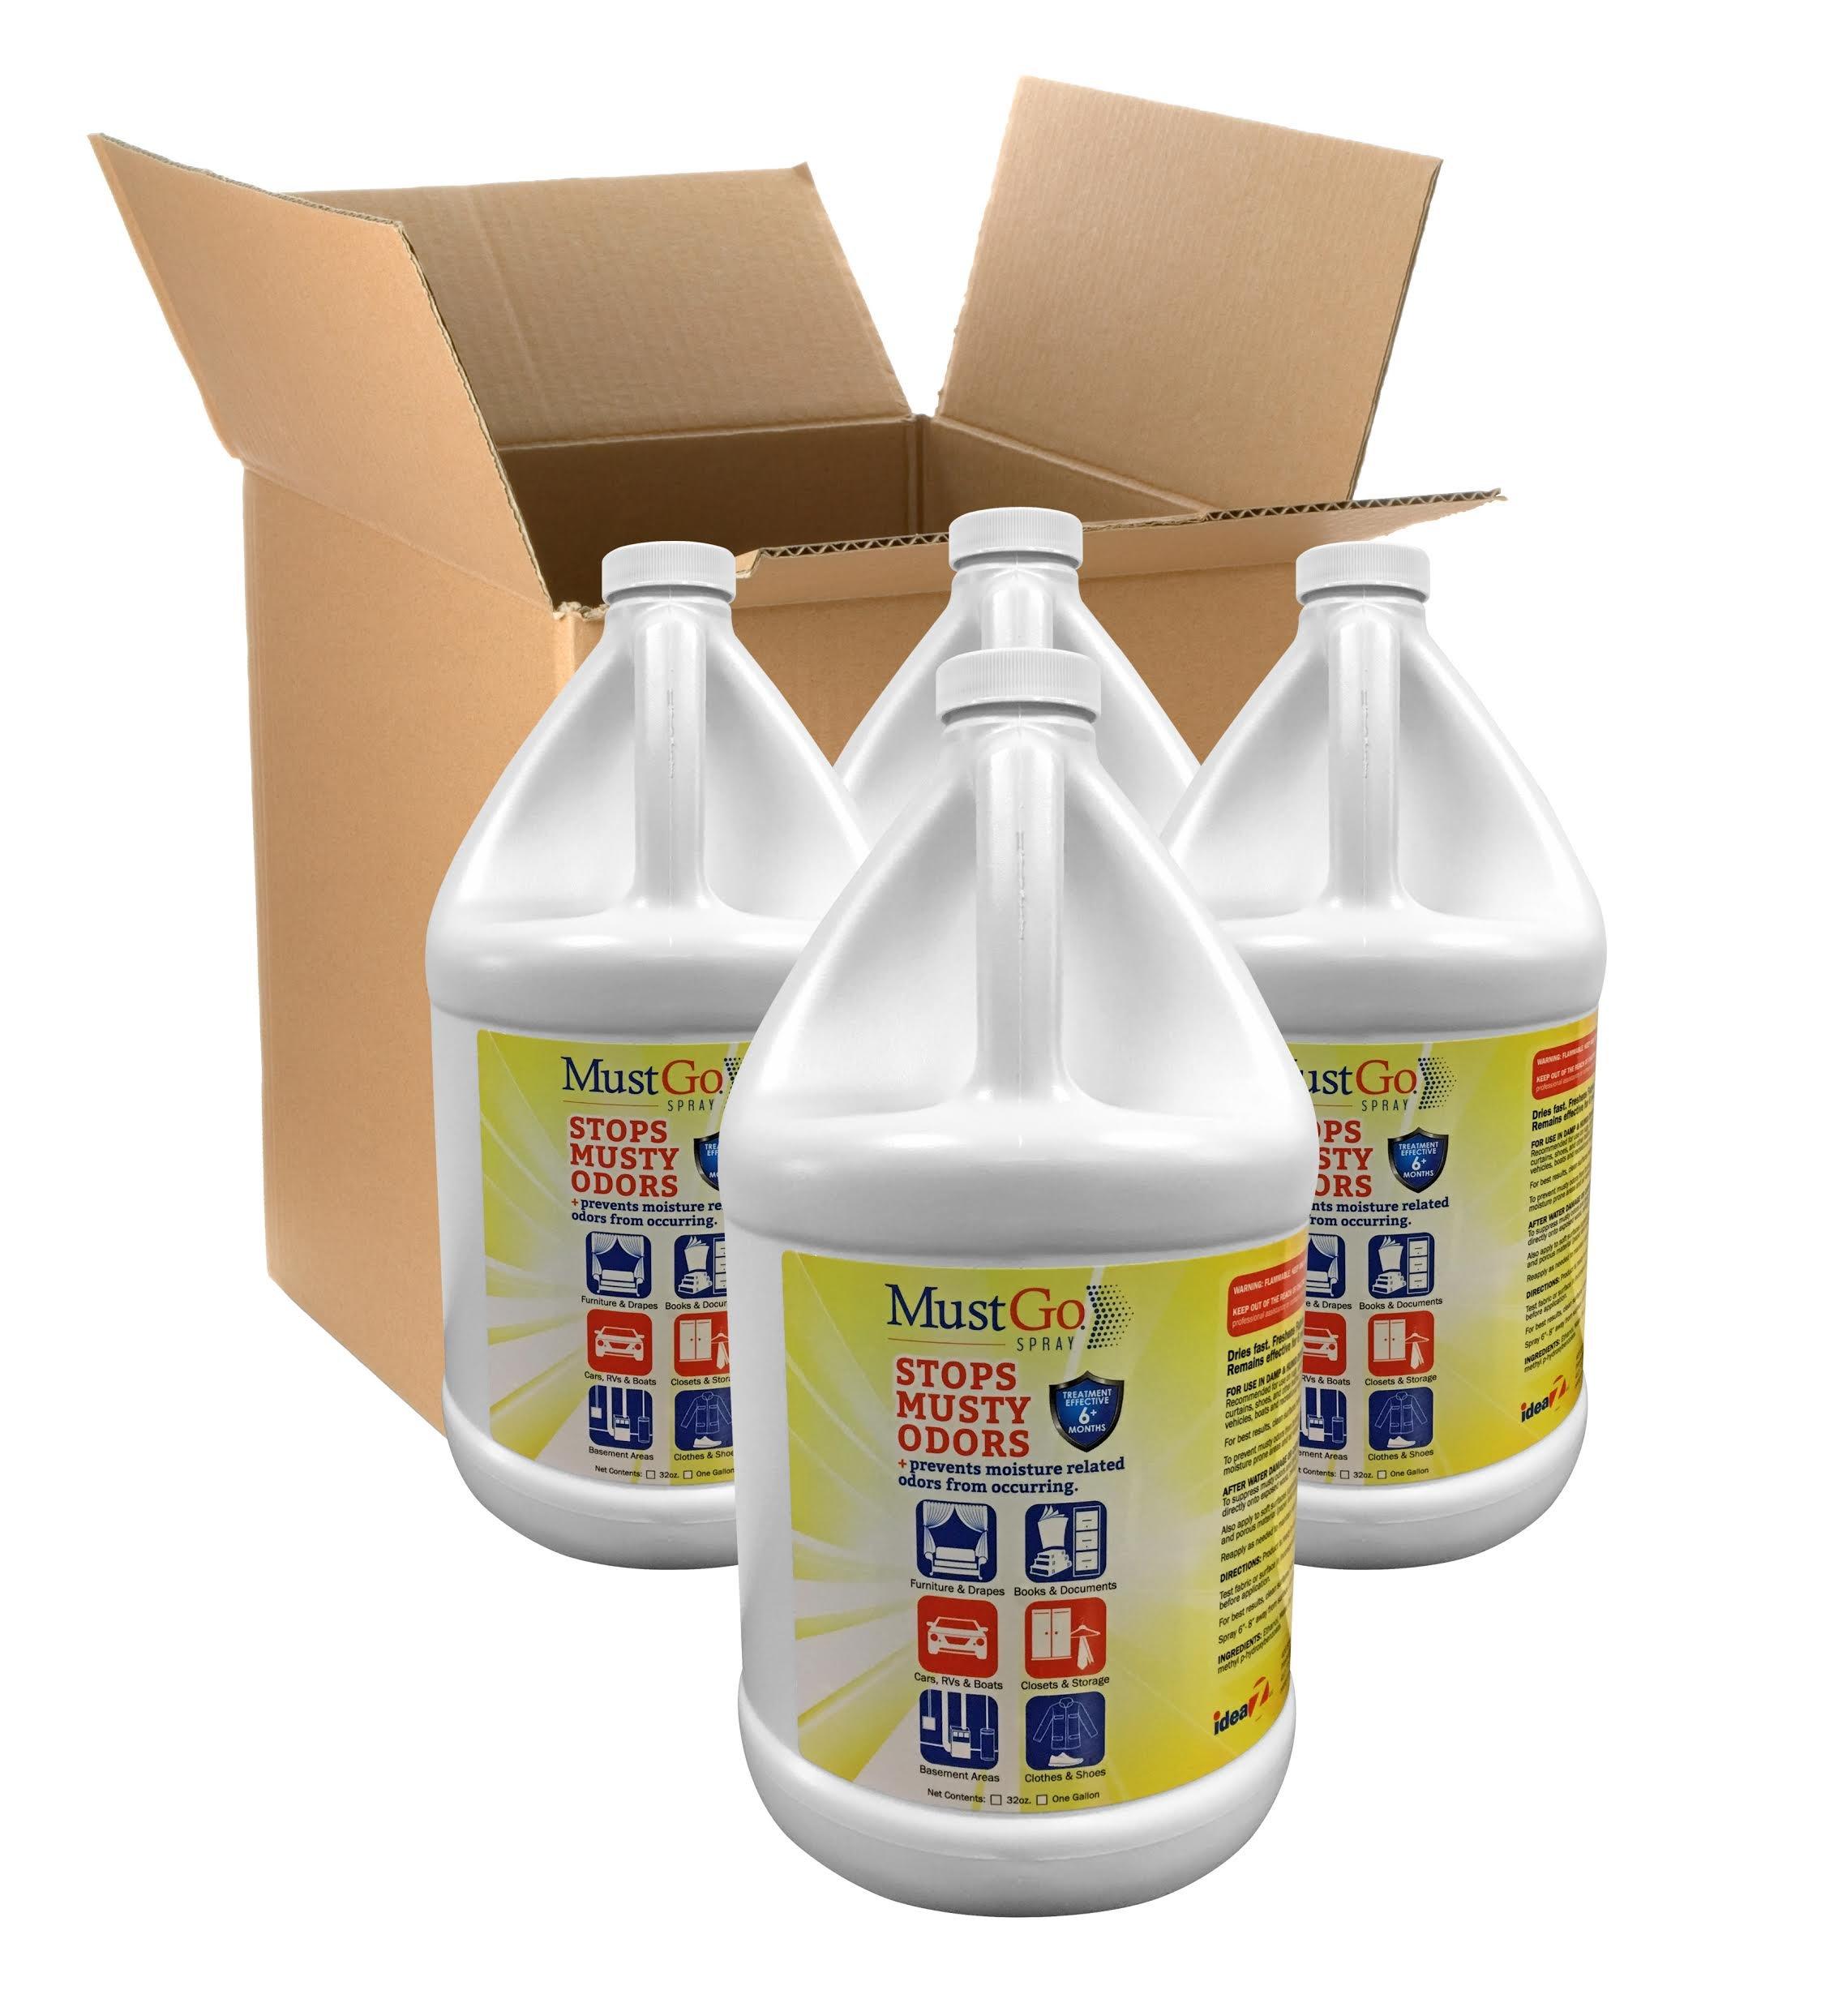 MustGo Odor Eliminator Fabric Spray - Controls and Prevents Damp, Musty, Mildew Odors - Unscented - 4 x 1 Gallon Case